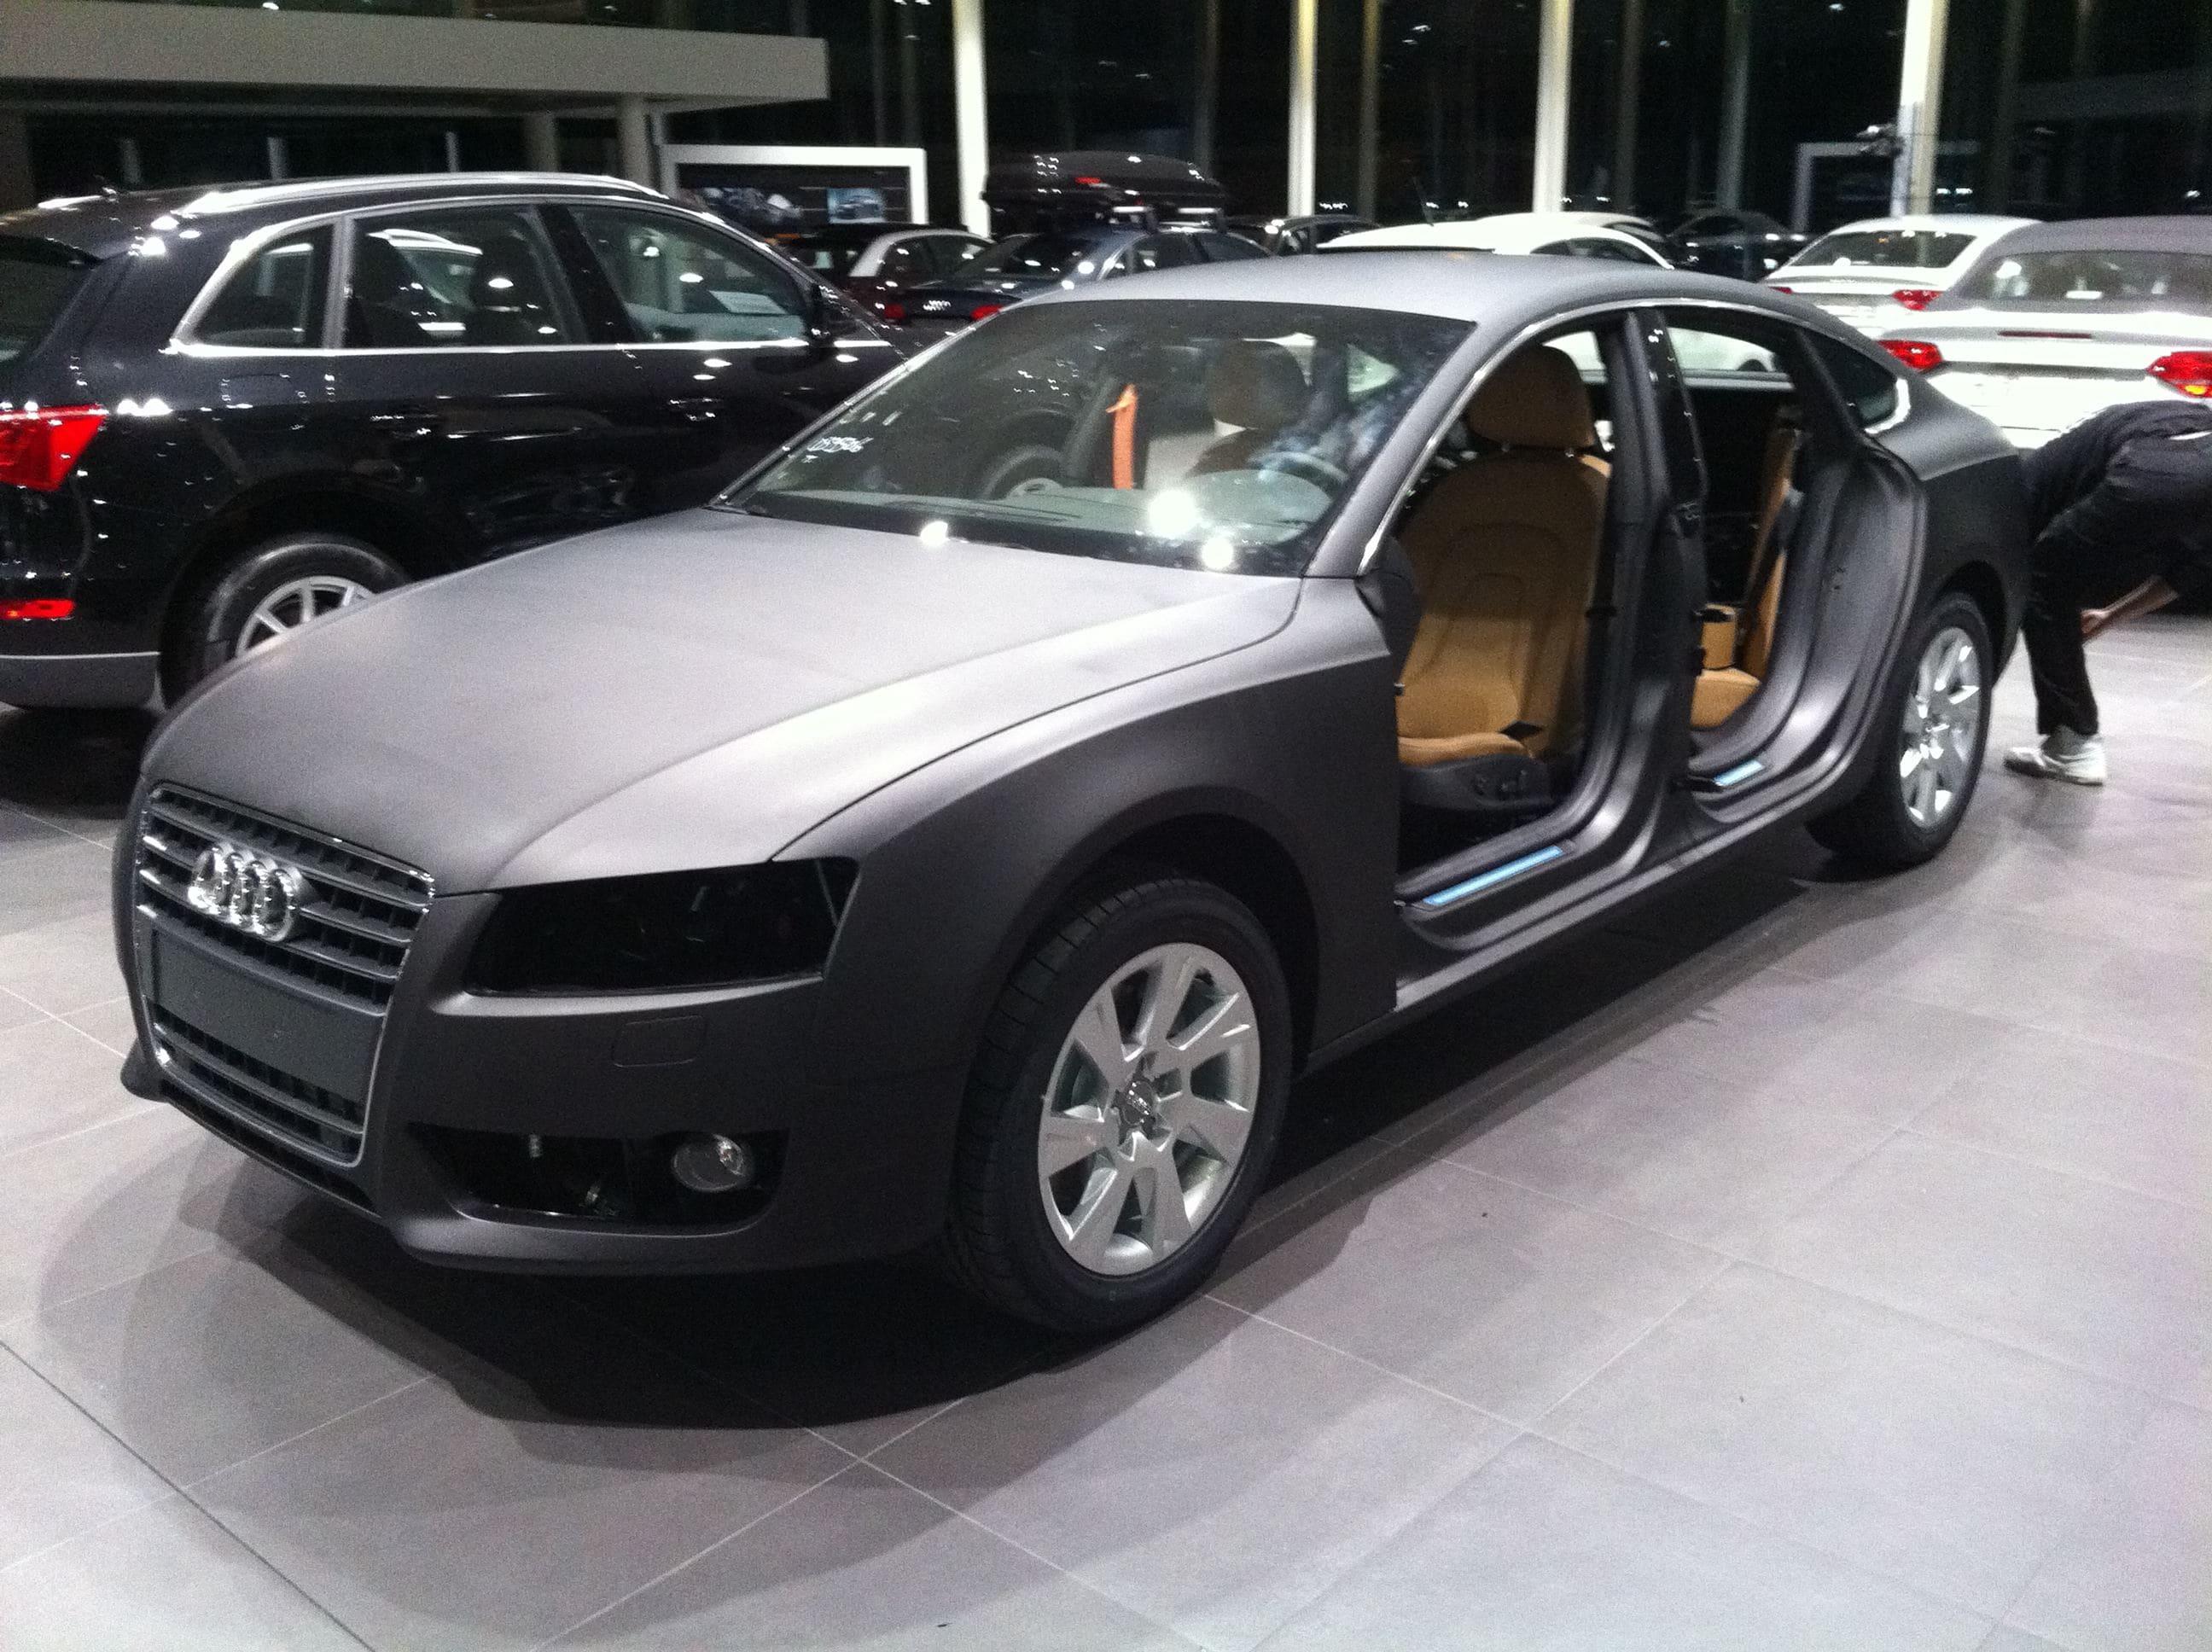 Audi A5 Sportback met Mat Grijze Wrap, Carwrapping door Wrapmyride.nu Foto-nr:4783, ©2021